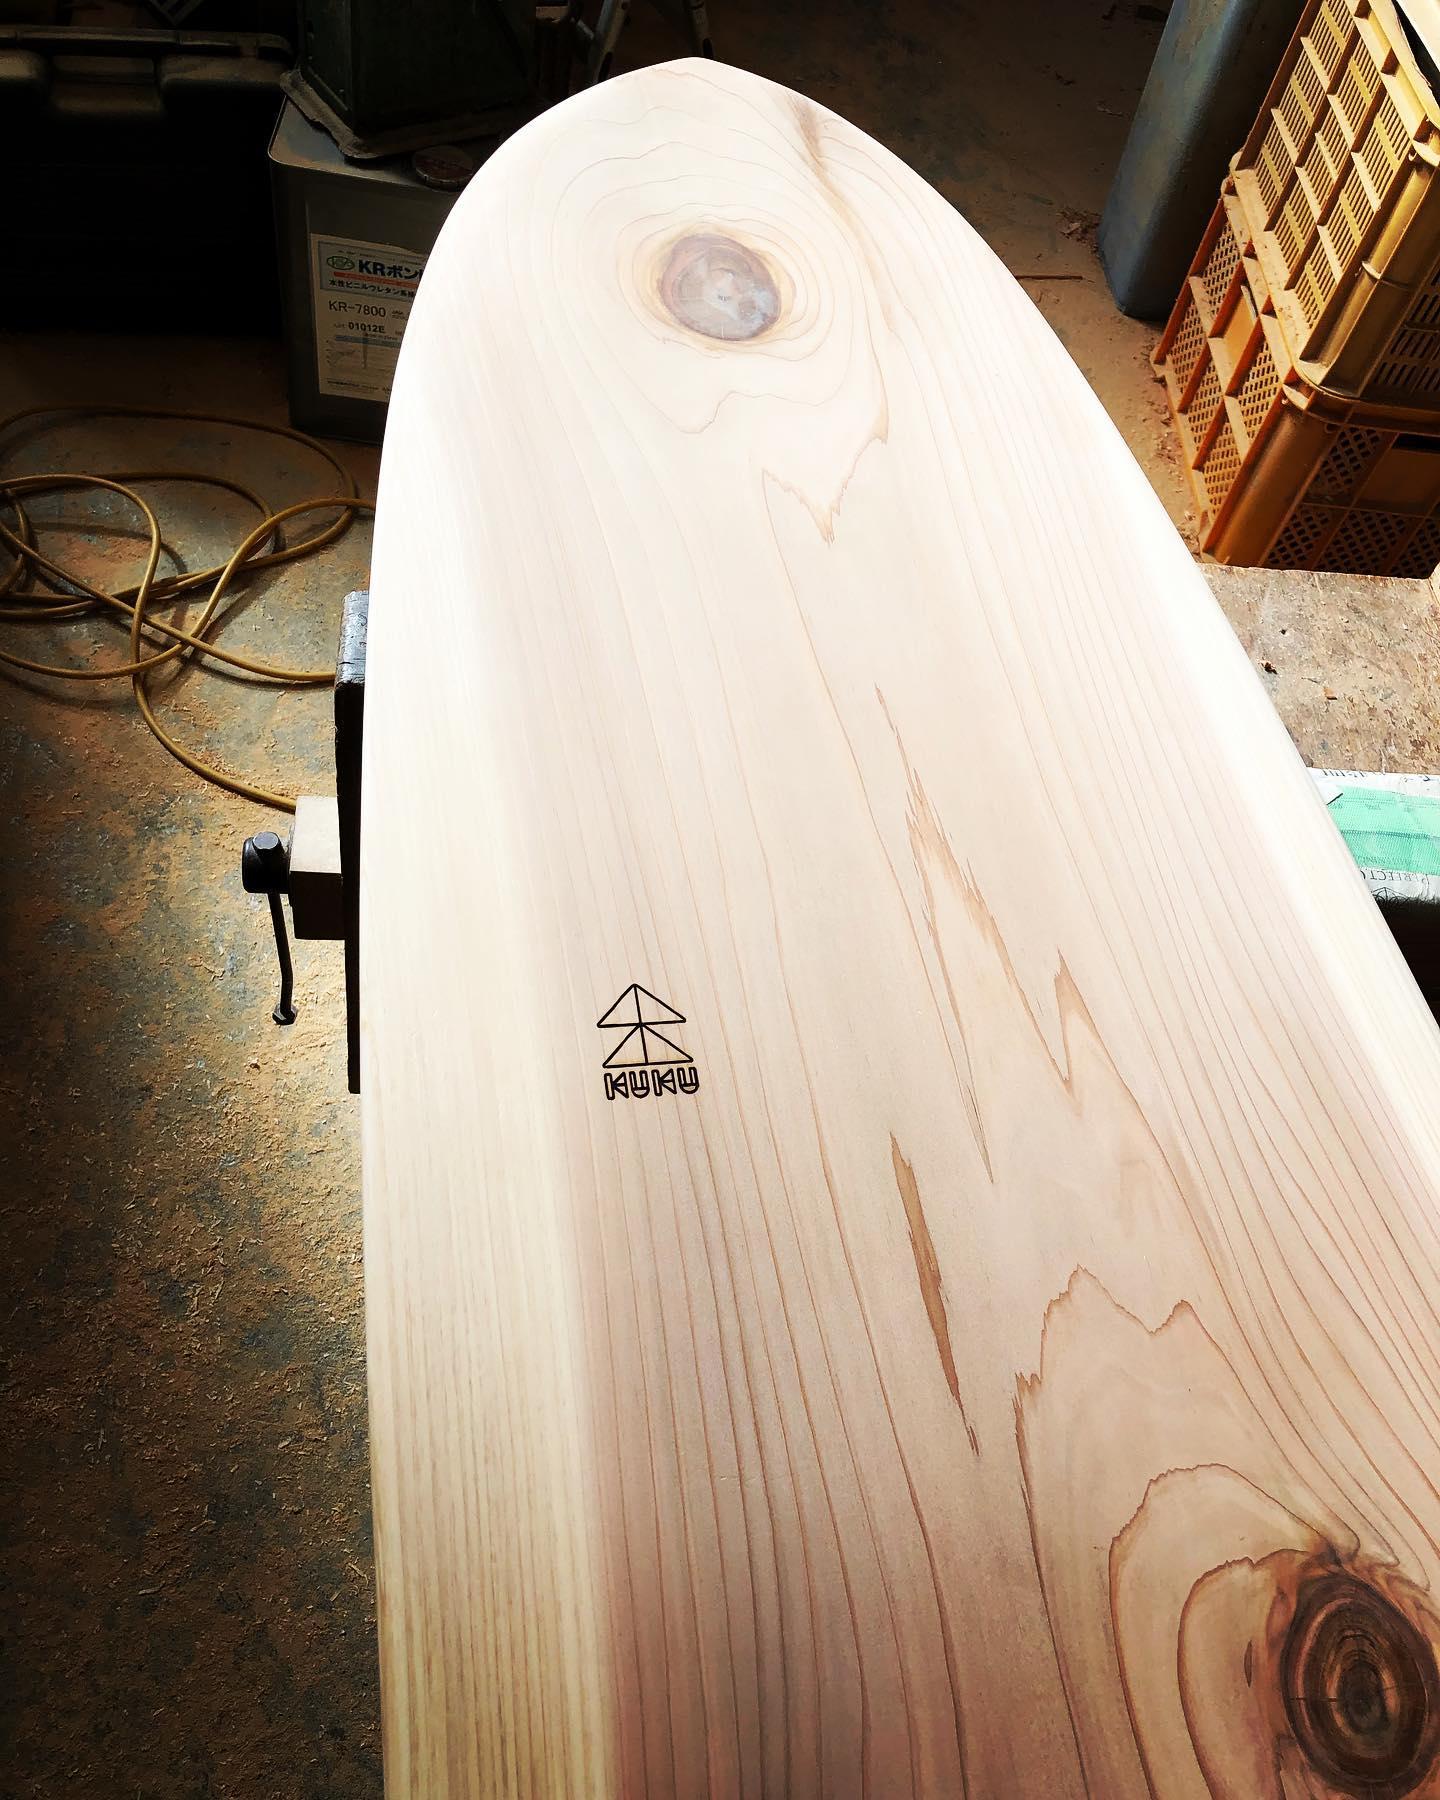 wood board製作レーザー加工でKUKUロゴを入れました〜いよいよ最終の塗装工程へ。#woodboardkuku#木頭杉#樹齢100年 #一枚板#天然木#無垢材#ウッドボード#display #cafe #surfing @woodboardkuku @indianeagleyasu @nakawood